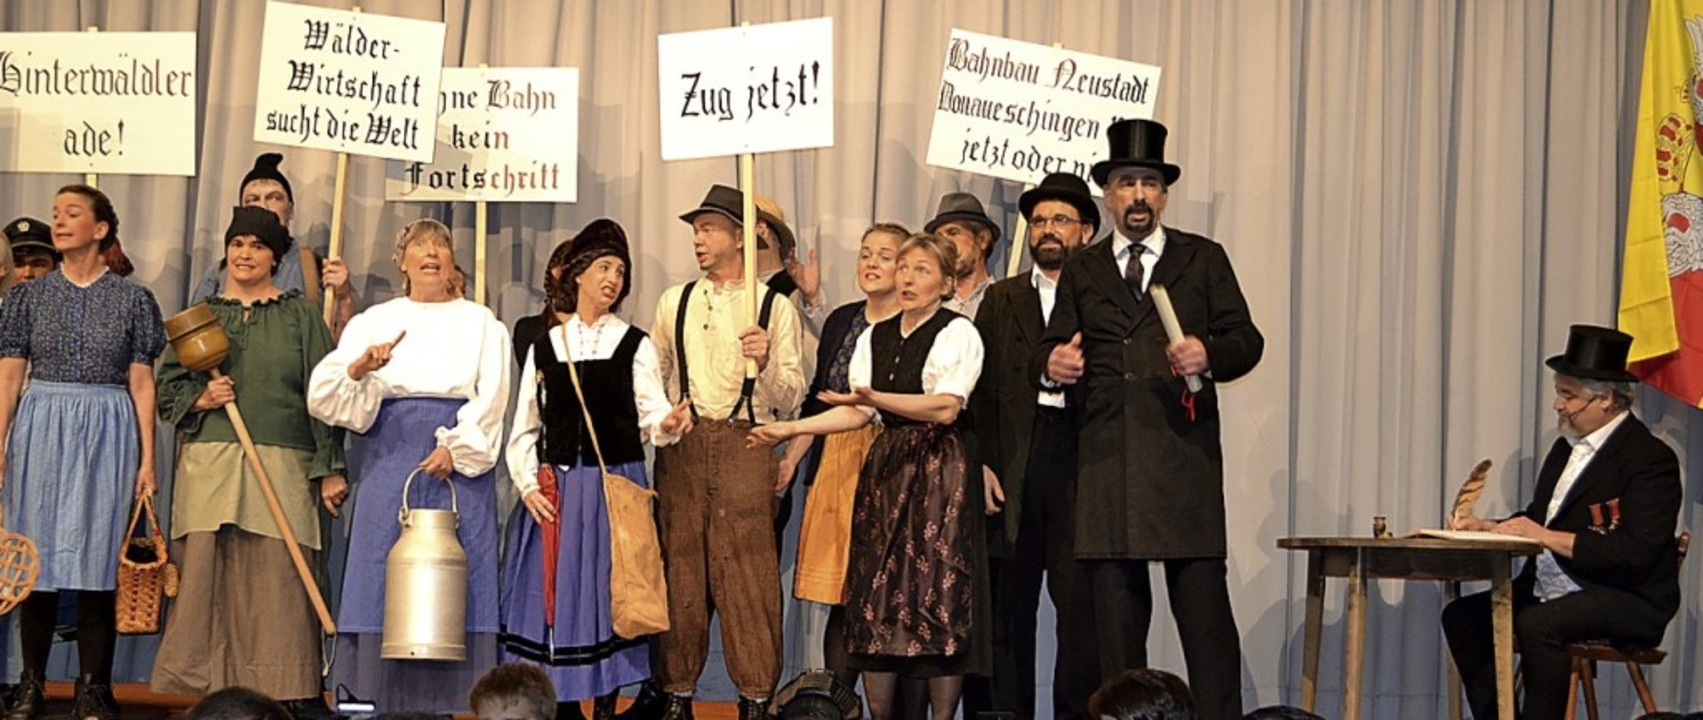 Bürgermeister Winterhalder (Armin Hase...f Langenbacher, rechts) eine Petition.  | Foto: Liane Schilling